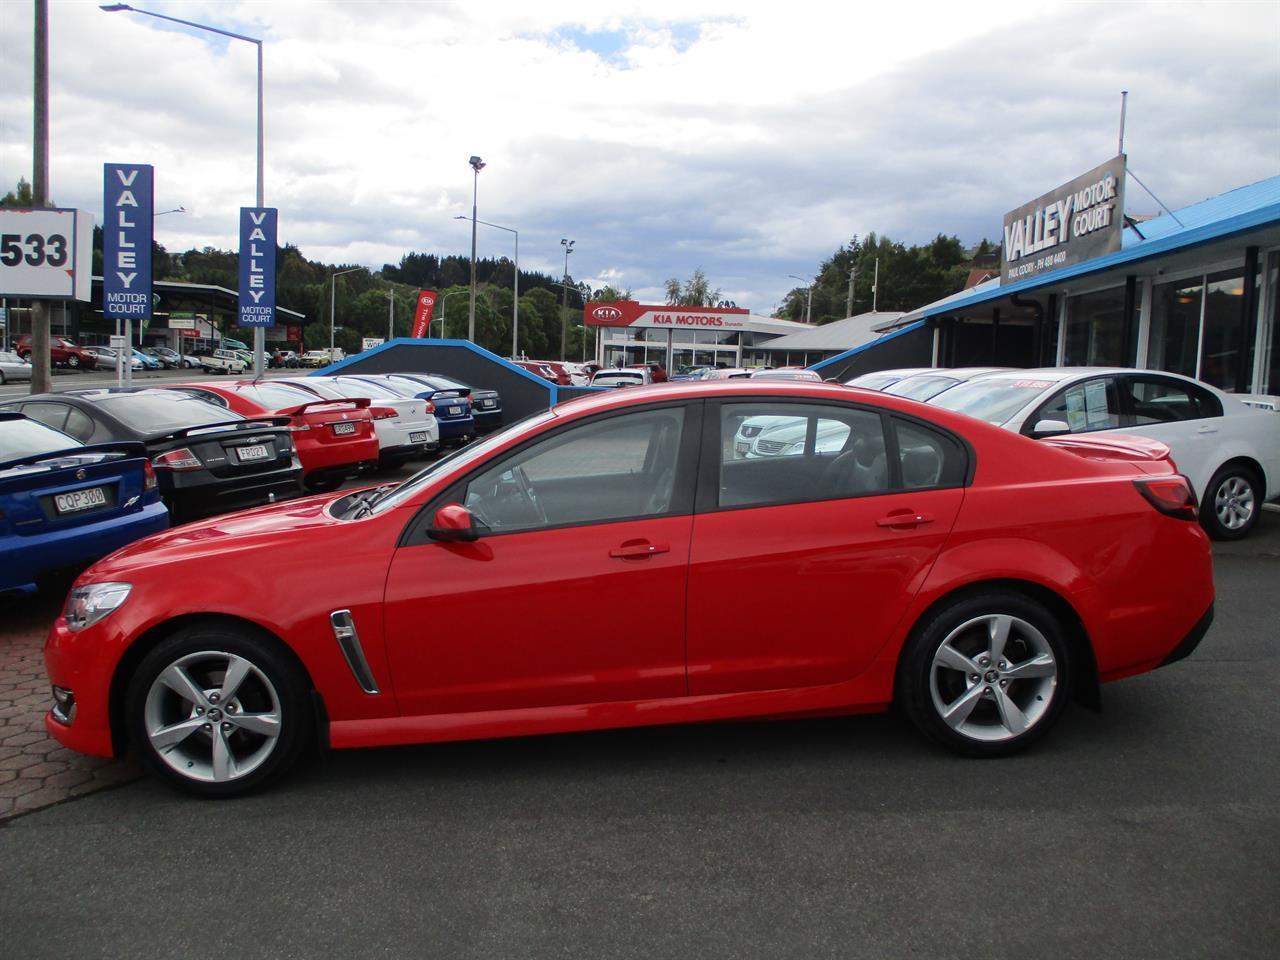 image-7, 2017 Holden Commodore VF2 SV6 3.6P/6AT/SL at Dunedin